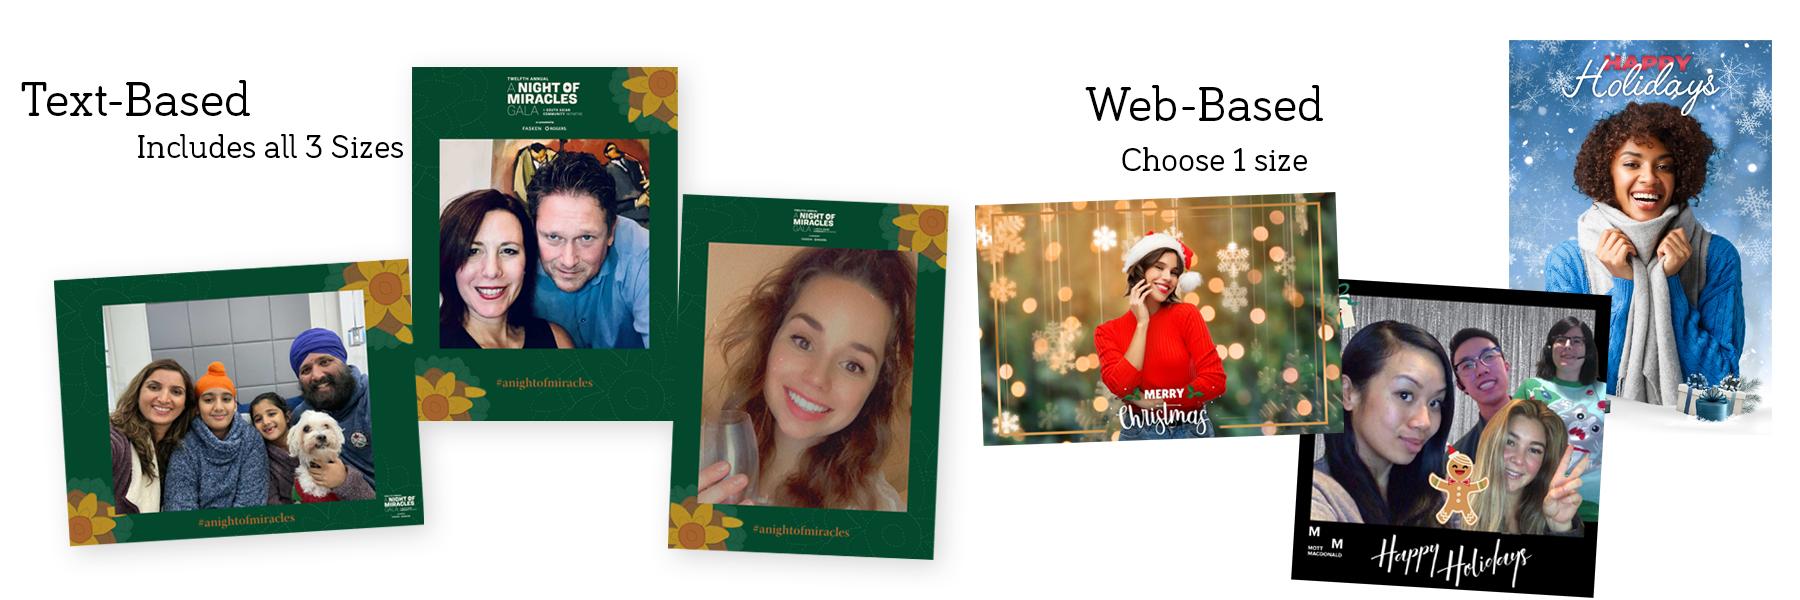 Virtual photobooth example